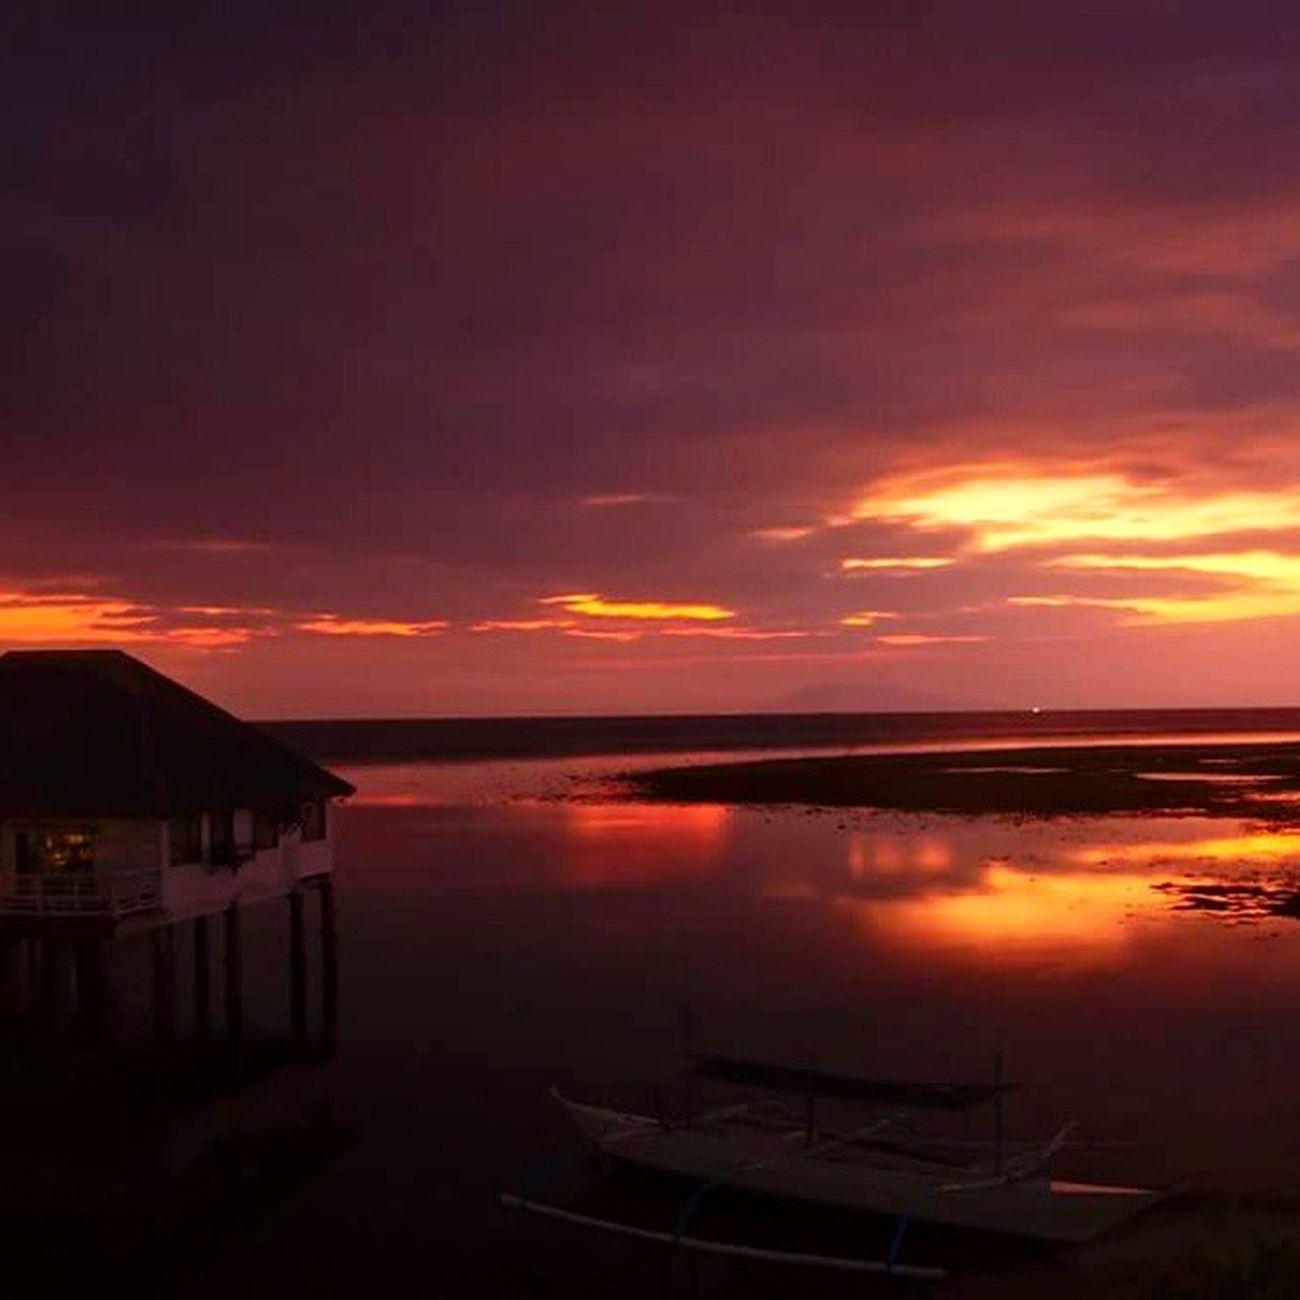 A beautiful sunset Philippines Batangas Stils Sunset Zen